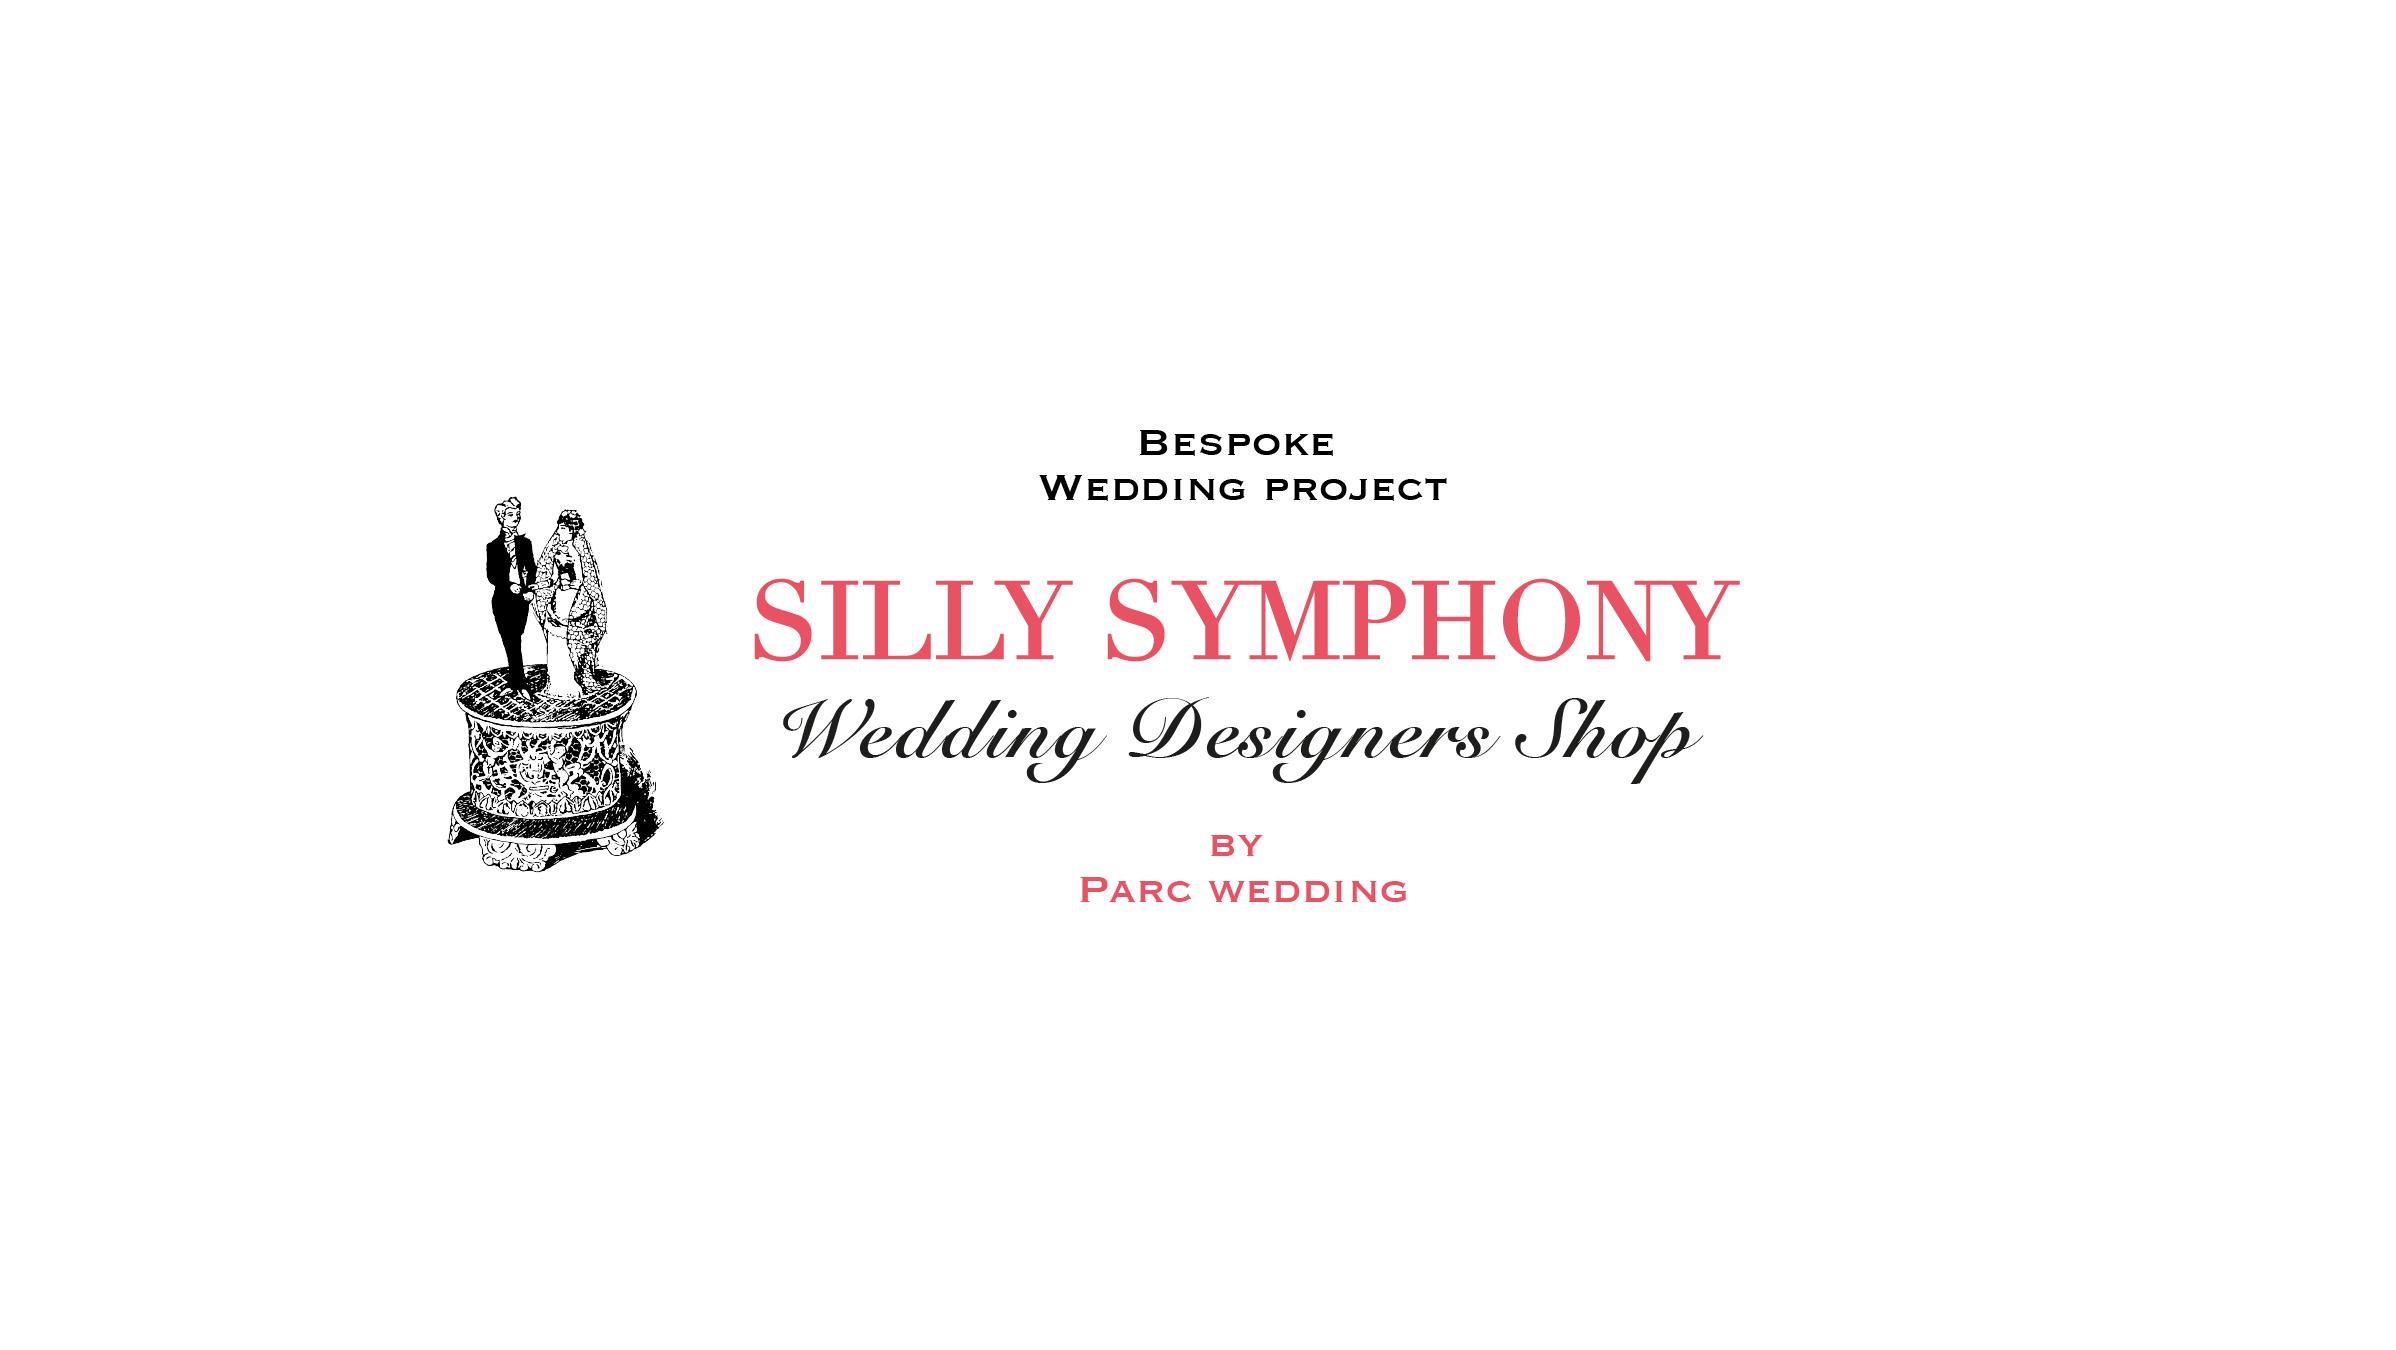 SillySymphonyLogo_Mar29-03.png